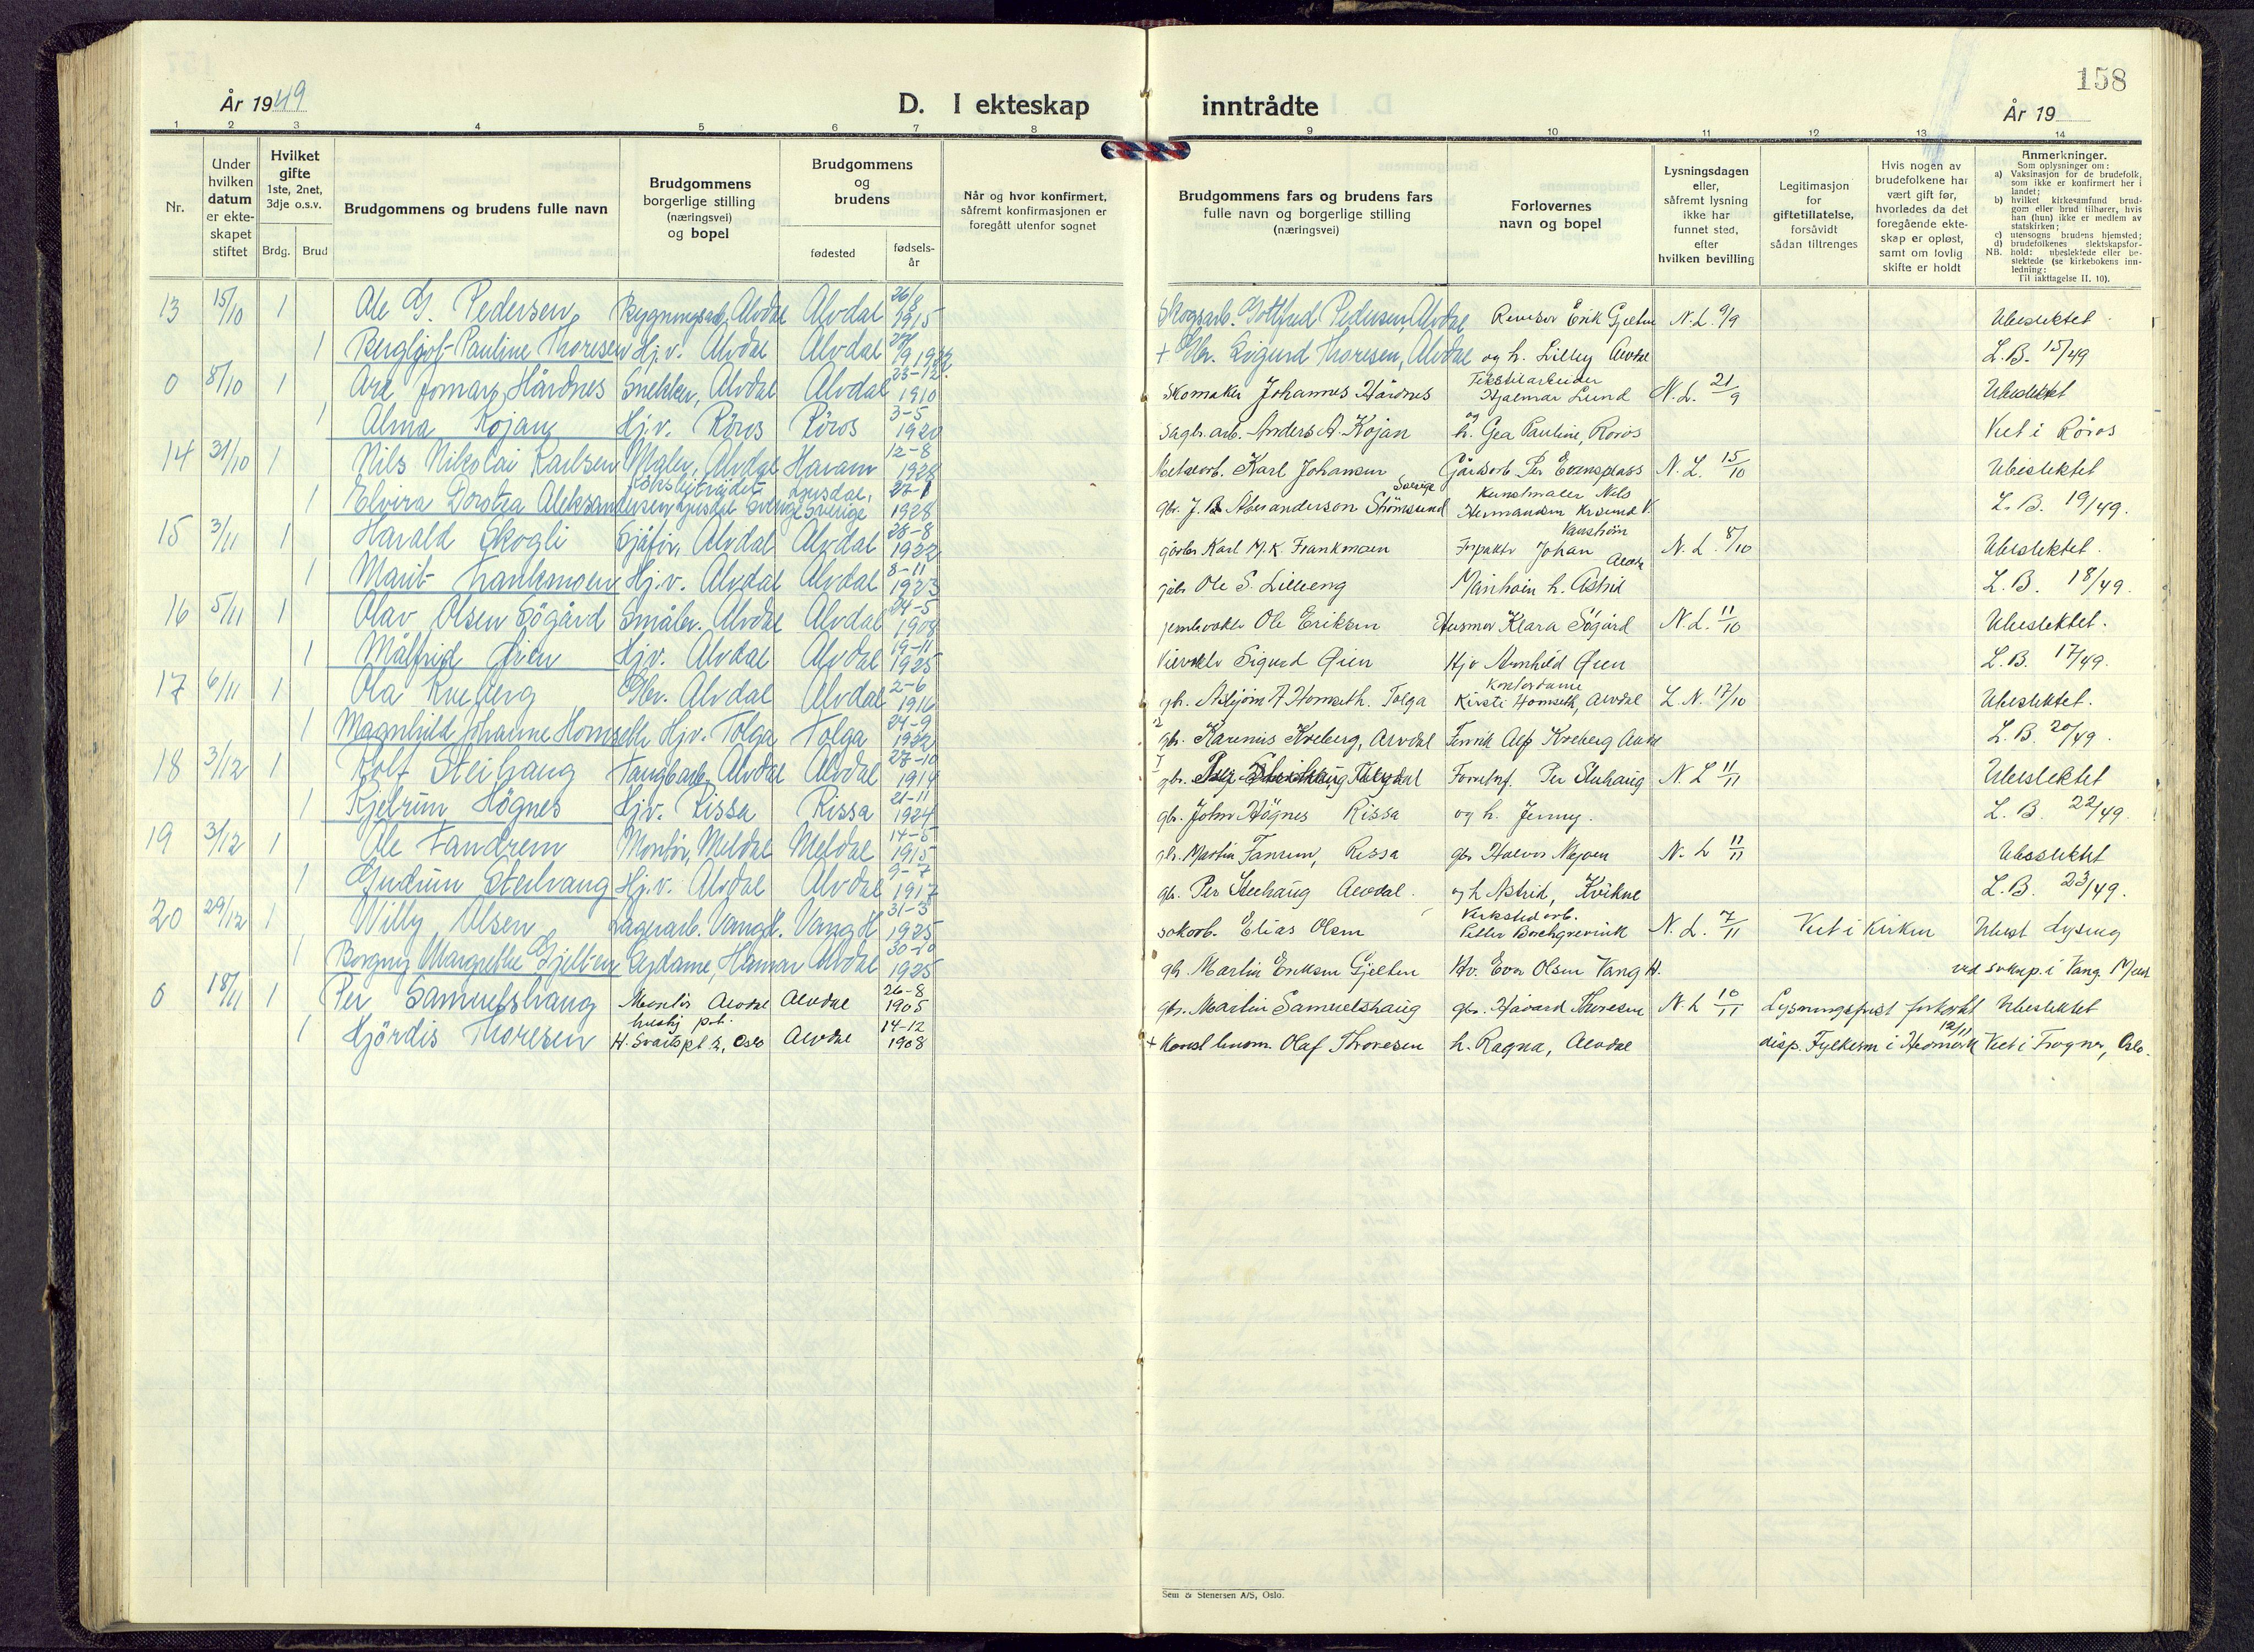 SAH, Alvdal prestekontor, Klokkerbok nr. 9, 1946-1965, s. 157b-158a